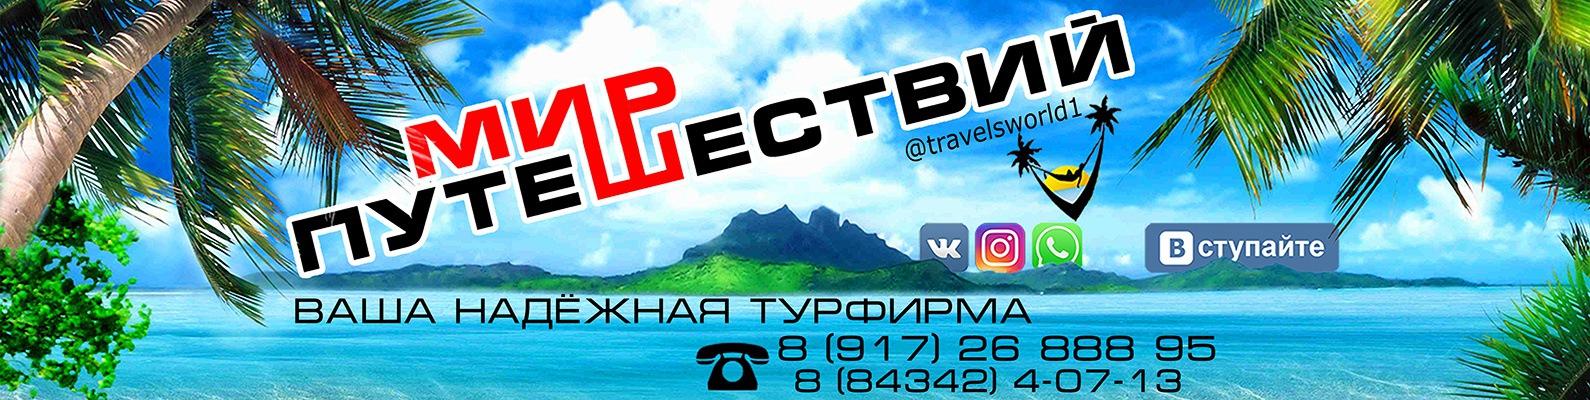 tur v greciju neponyatnyj kurort 21 130 rub chel 1 - Тур в Грецию непонятный курорт 21 130 руб. чел.